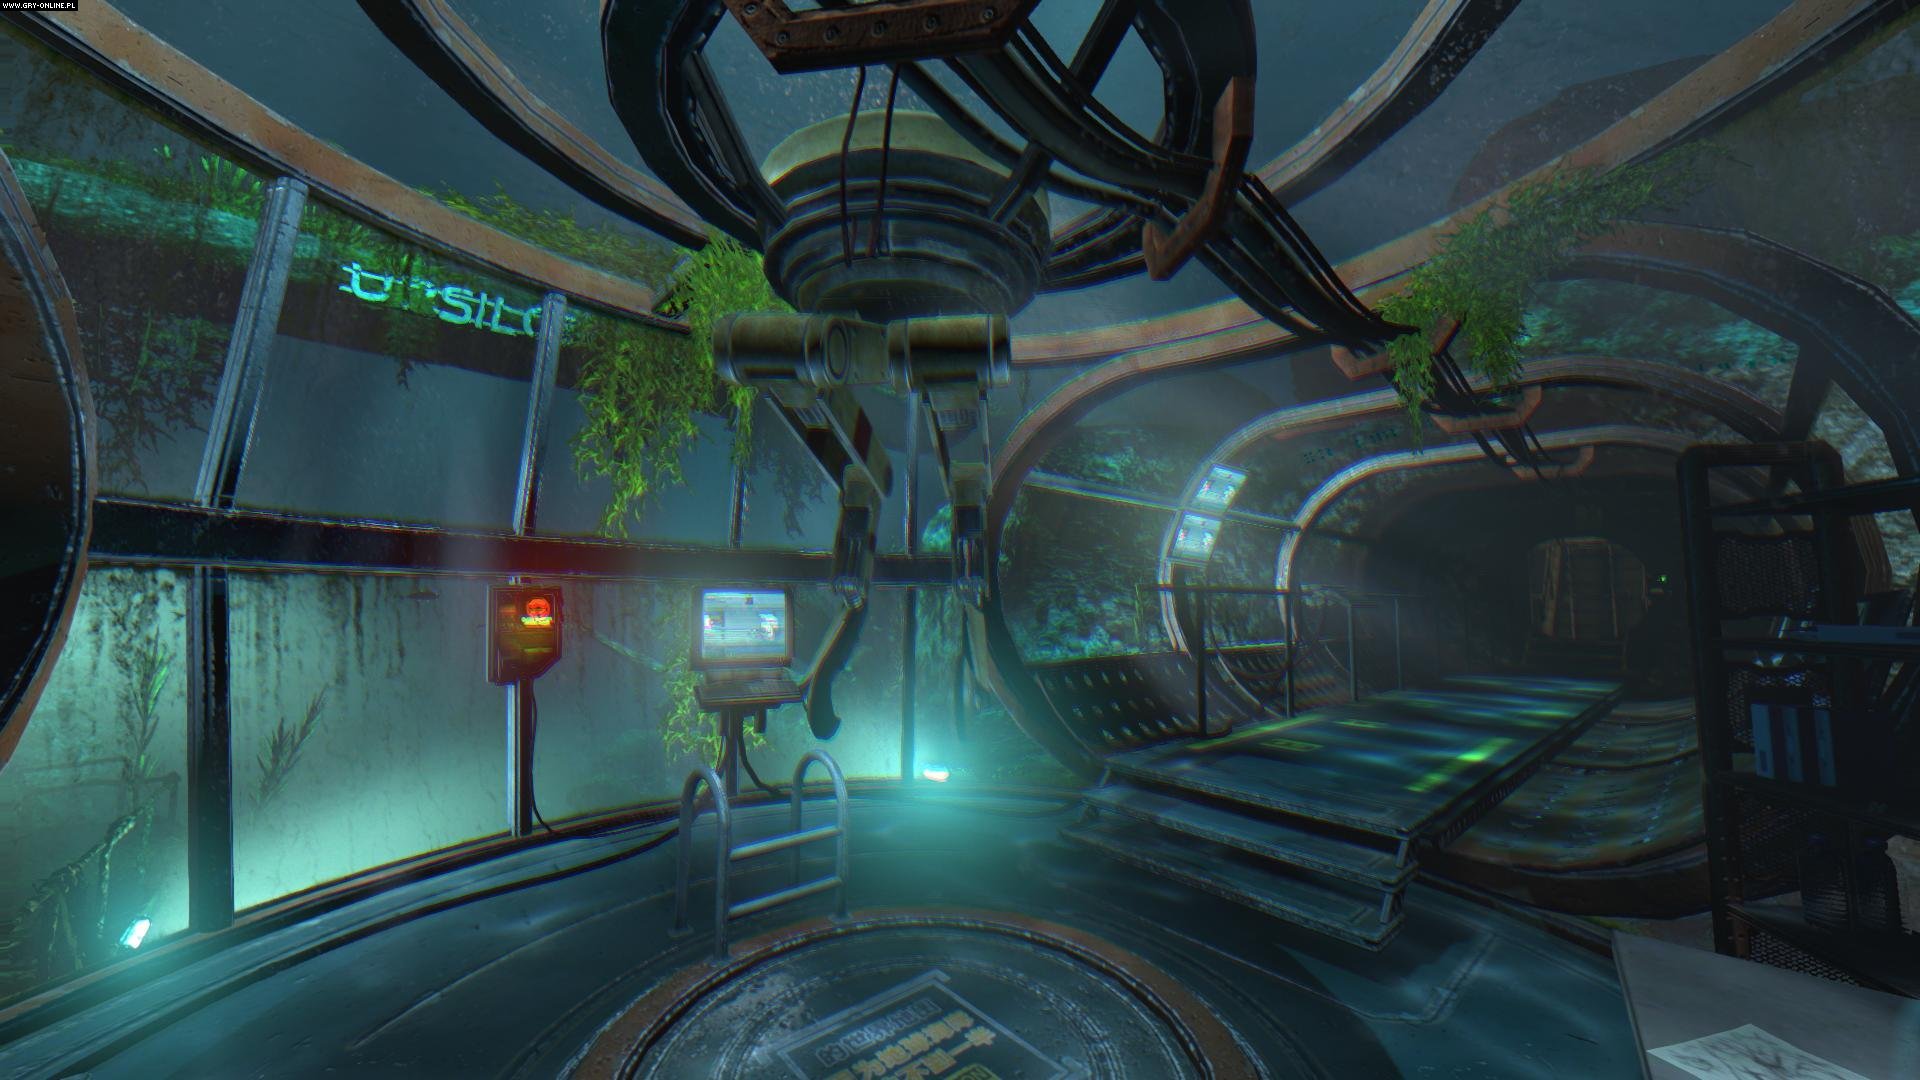 Ps4 Games Science Fiction : Soma screenshots gallery screenshot